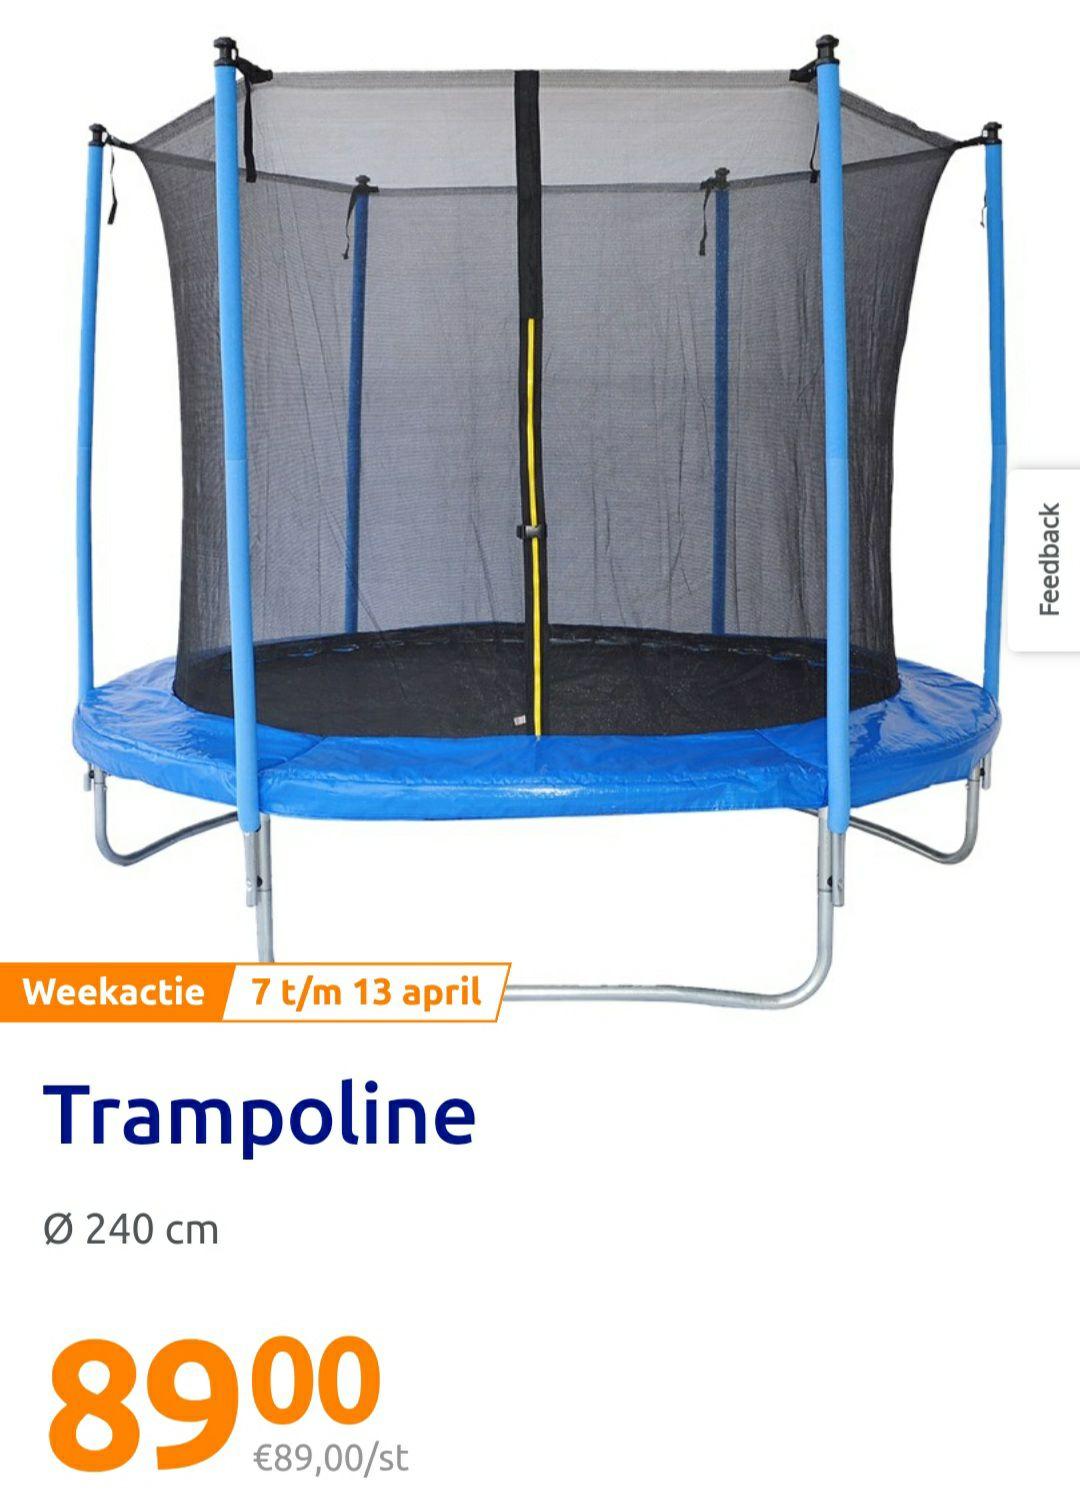 Weekaanbieding action Trampoline 240 cm